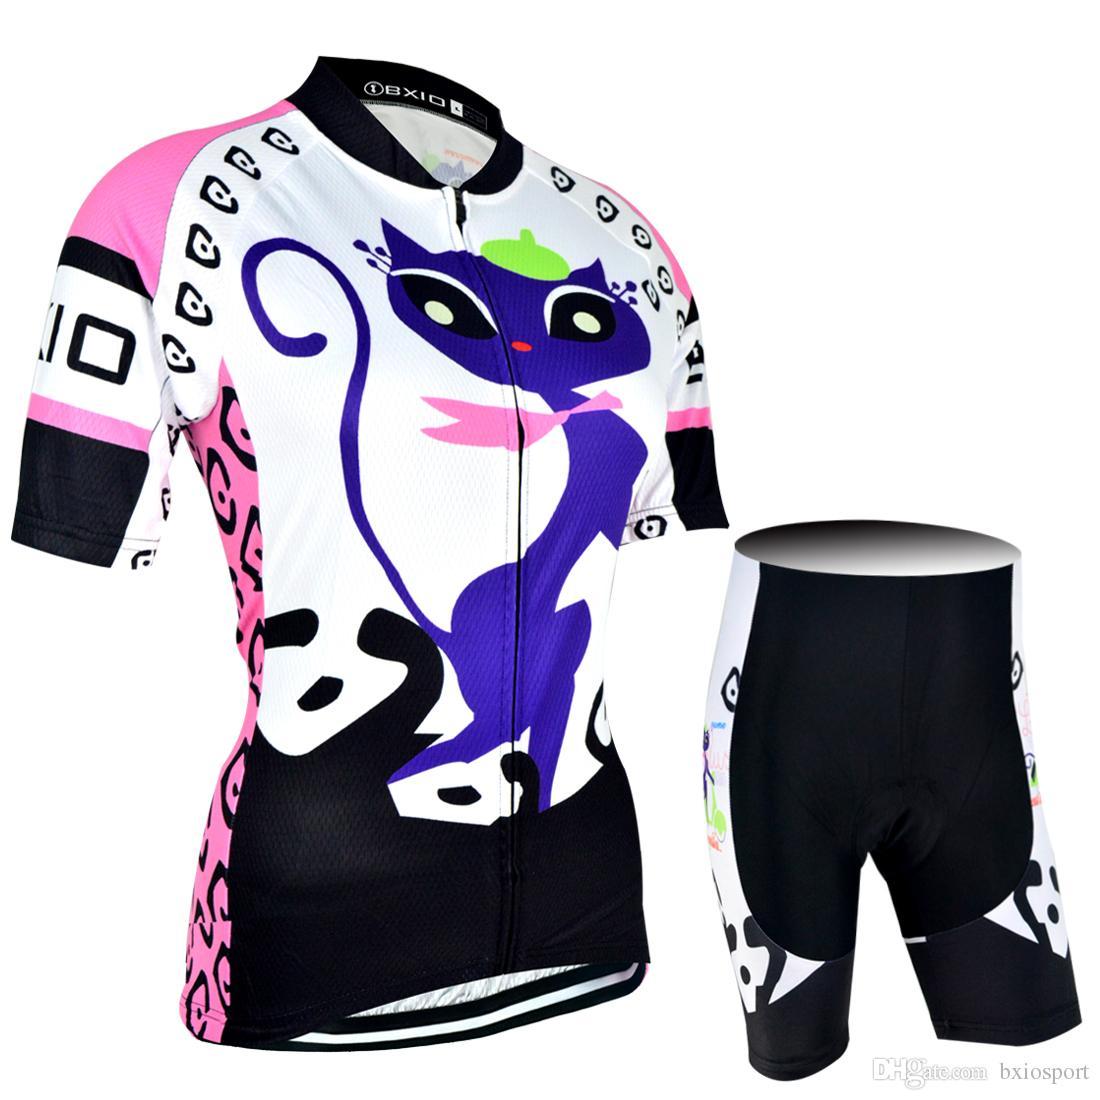 7409ece8e6e0f BXIO Marca Mujeres Ciclismo Jerseys Pro Equipo Divertido Gato Ciclismo Ropa  Establece Verano Ropa De Bicicleta De Manga Corta Mujer Ropa Ciclismo BX  044 Por ...